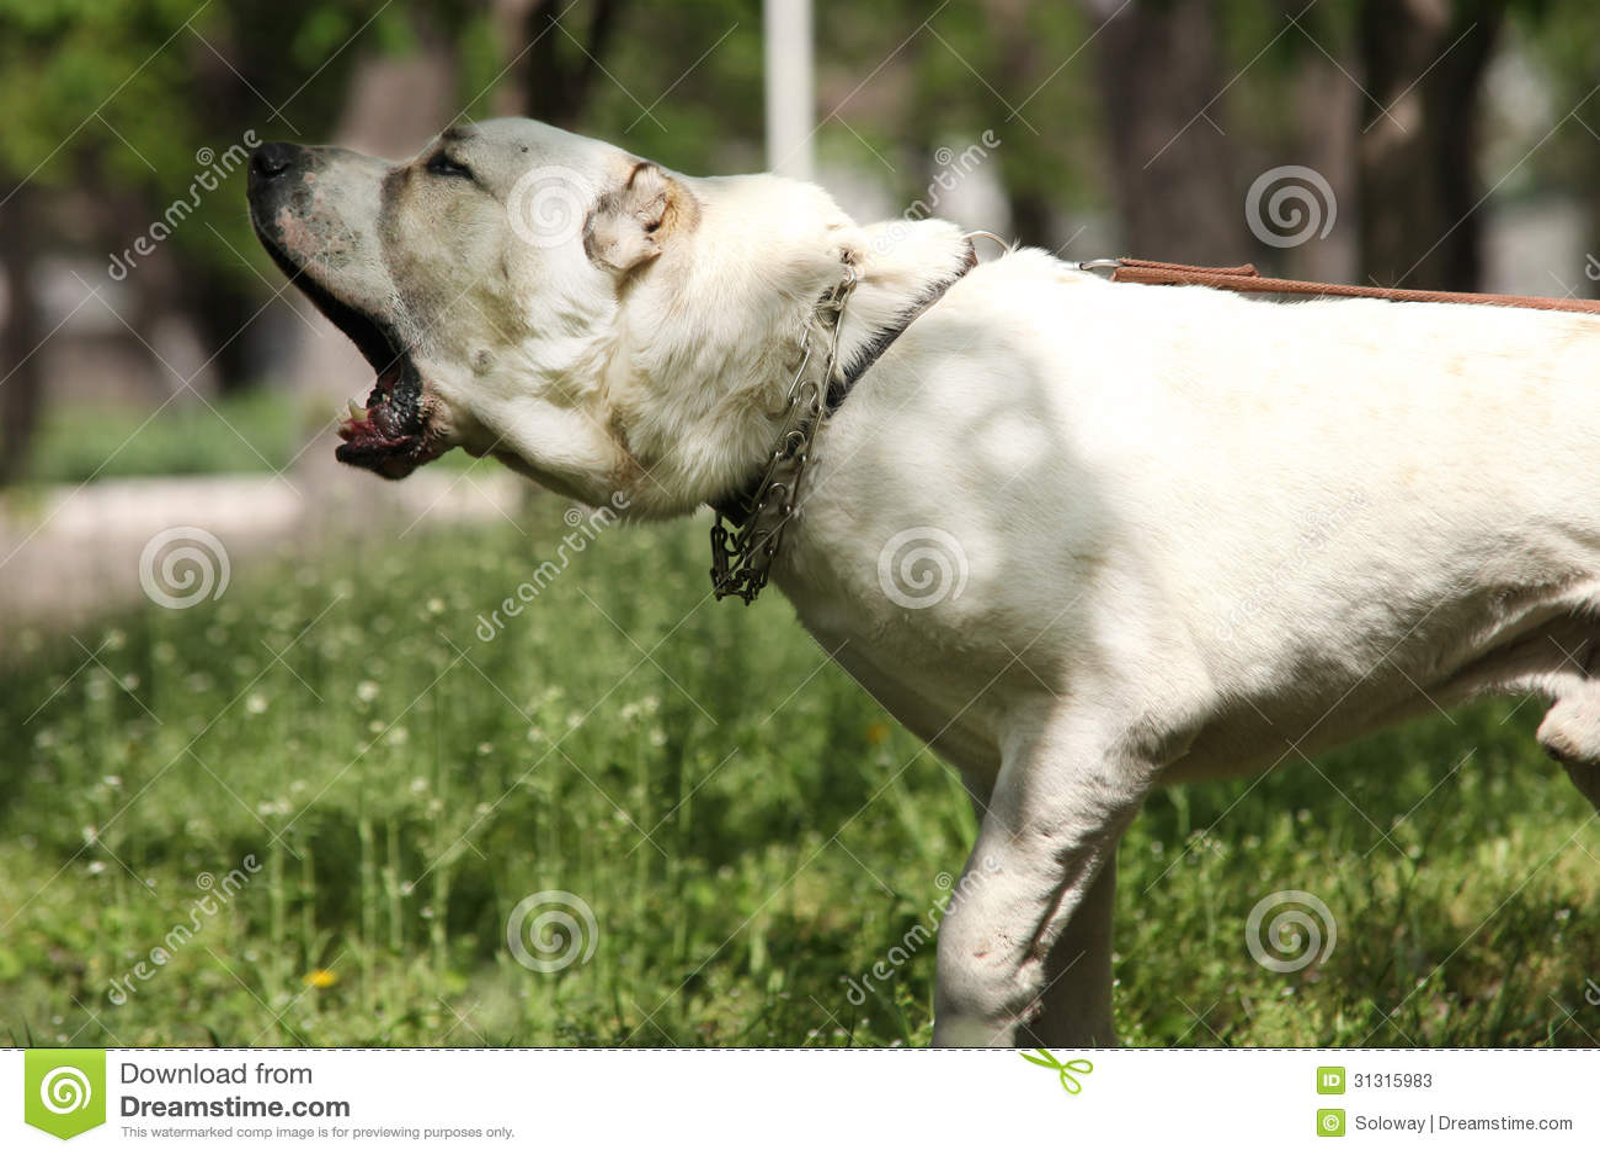 Central Bark Dog Training